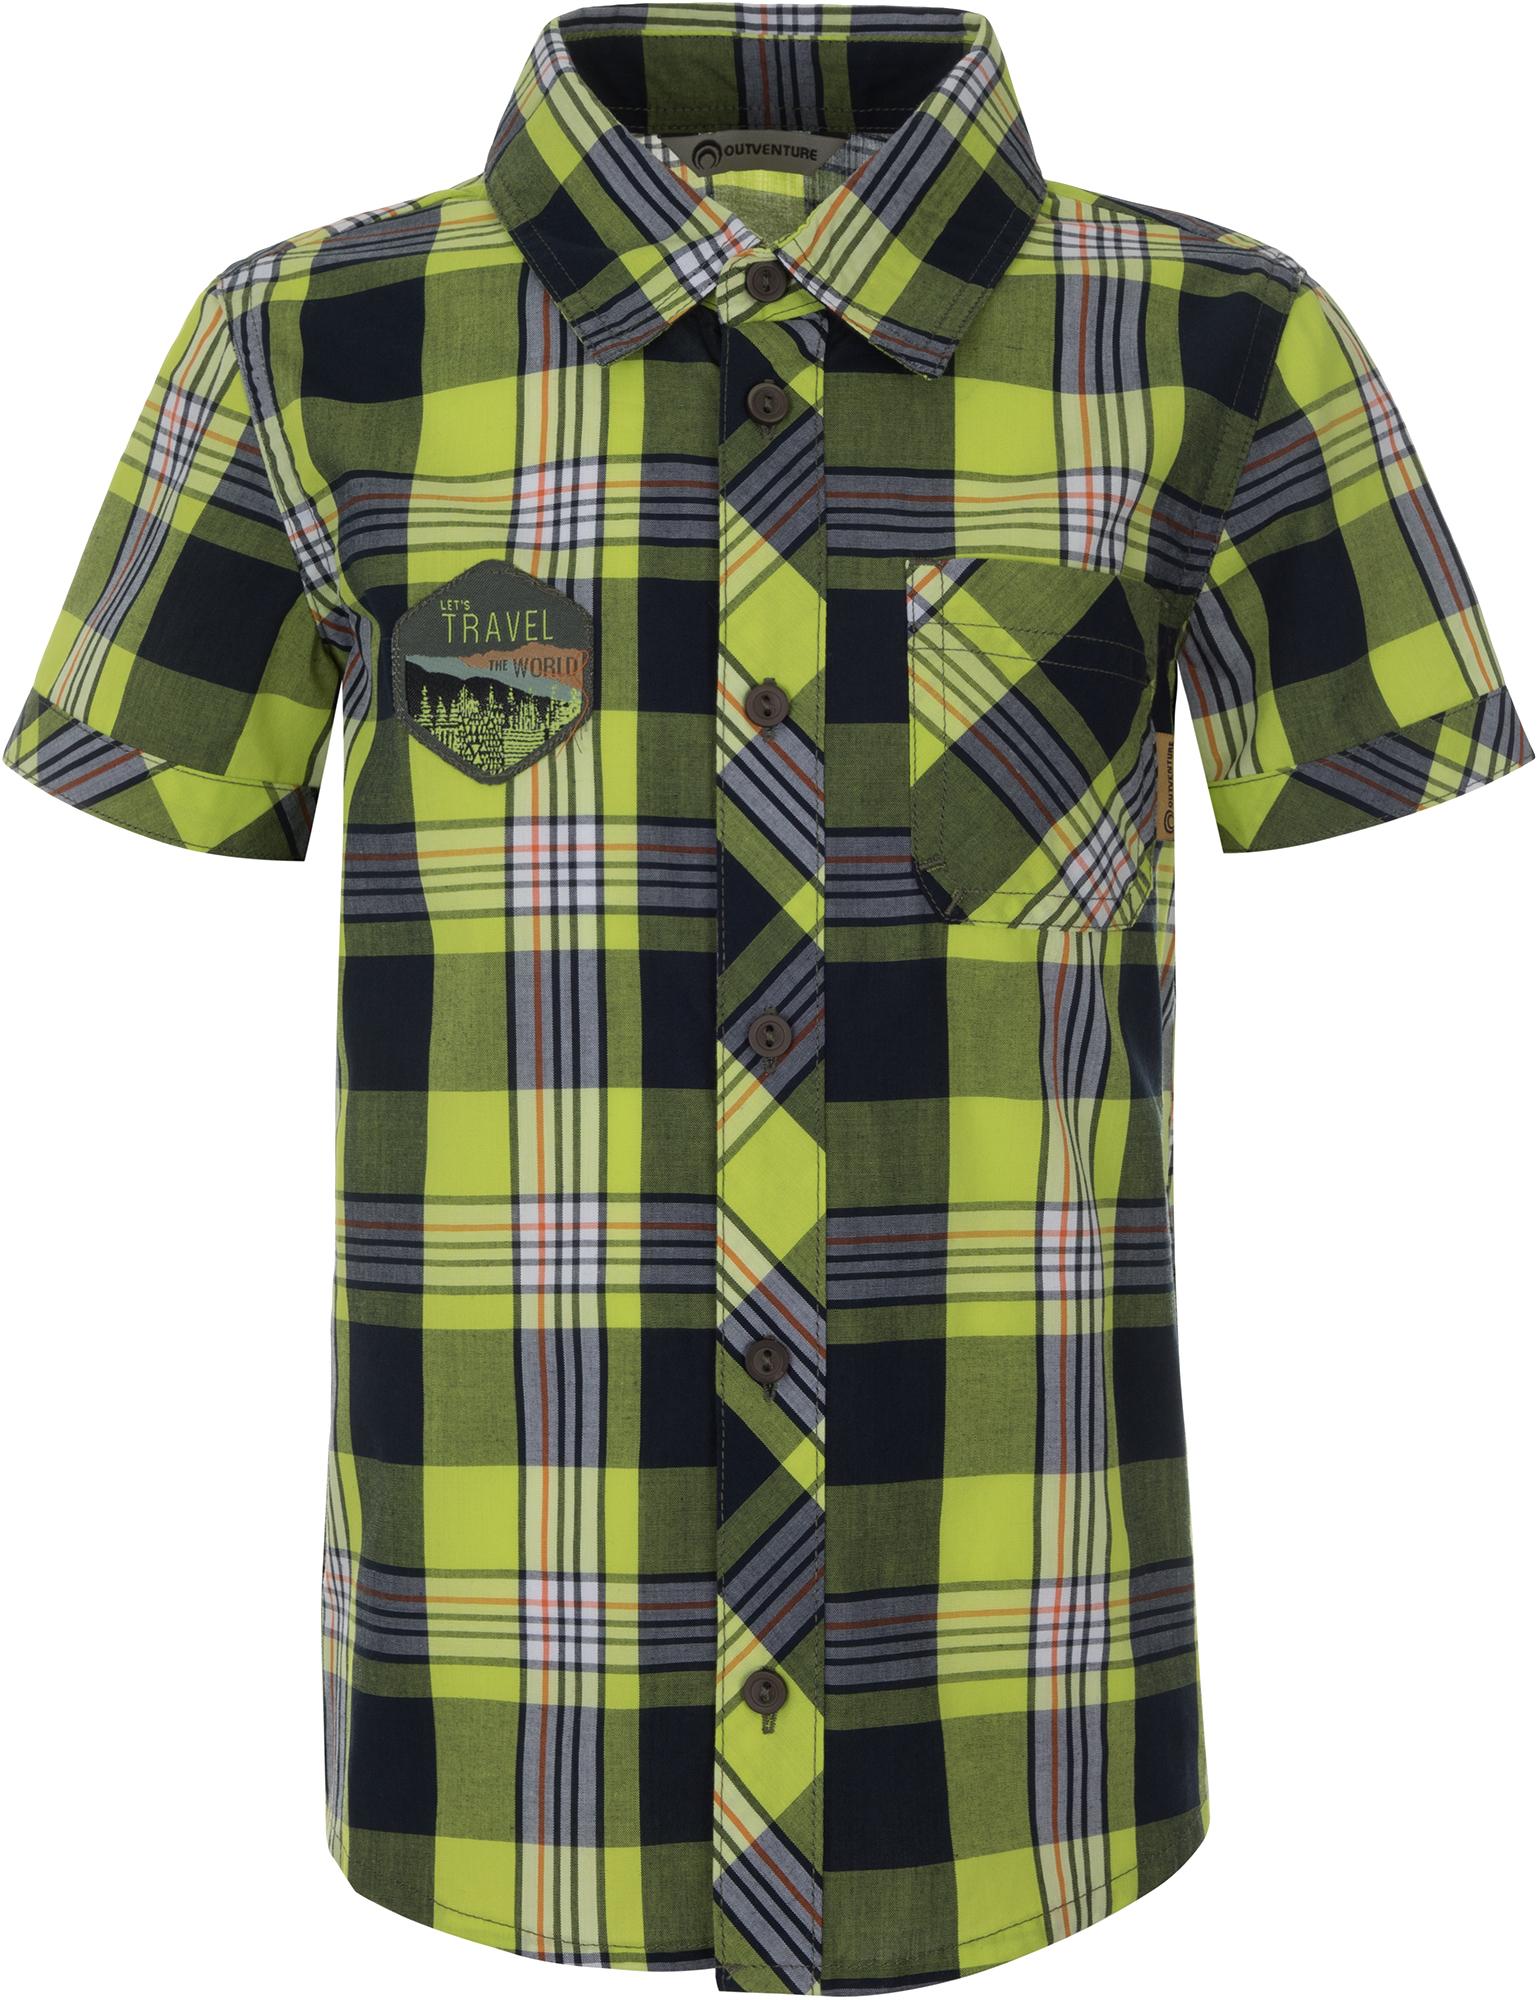 цена на Outventure Рубашка с коротким рукавом для мальчиков Outventure, размер 104